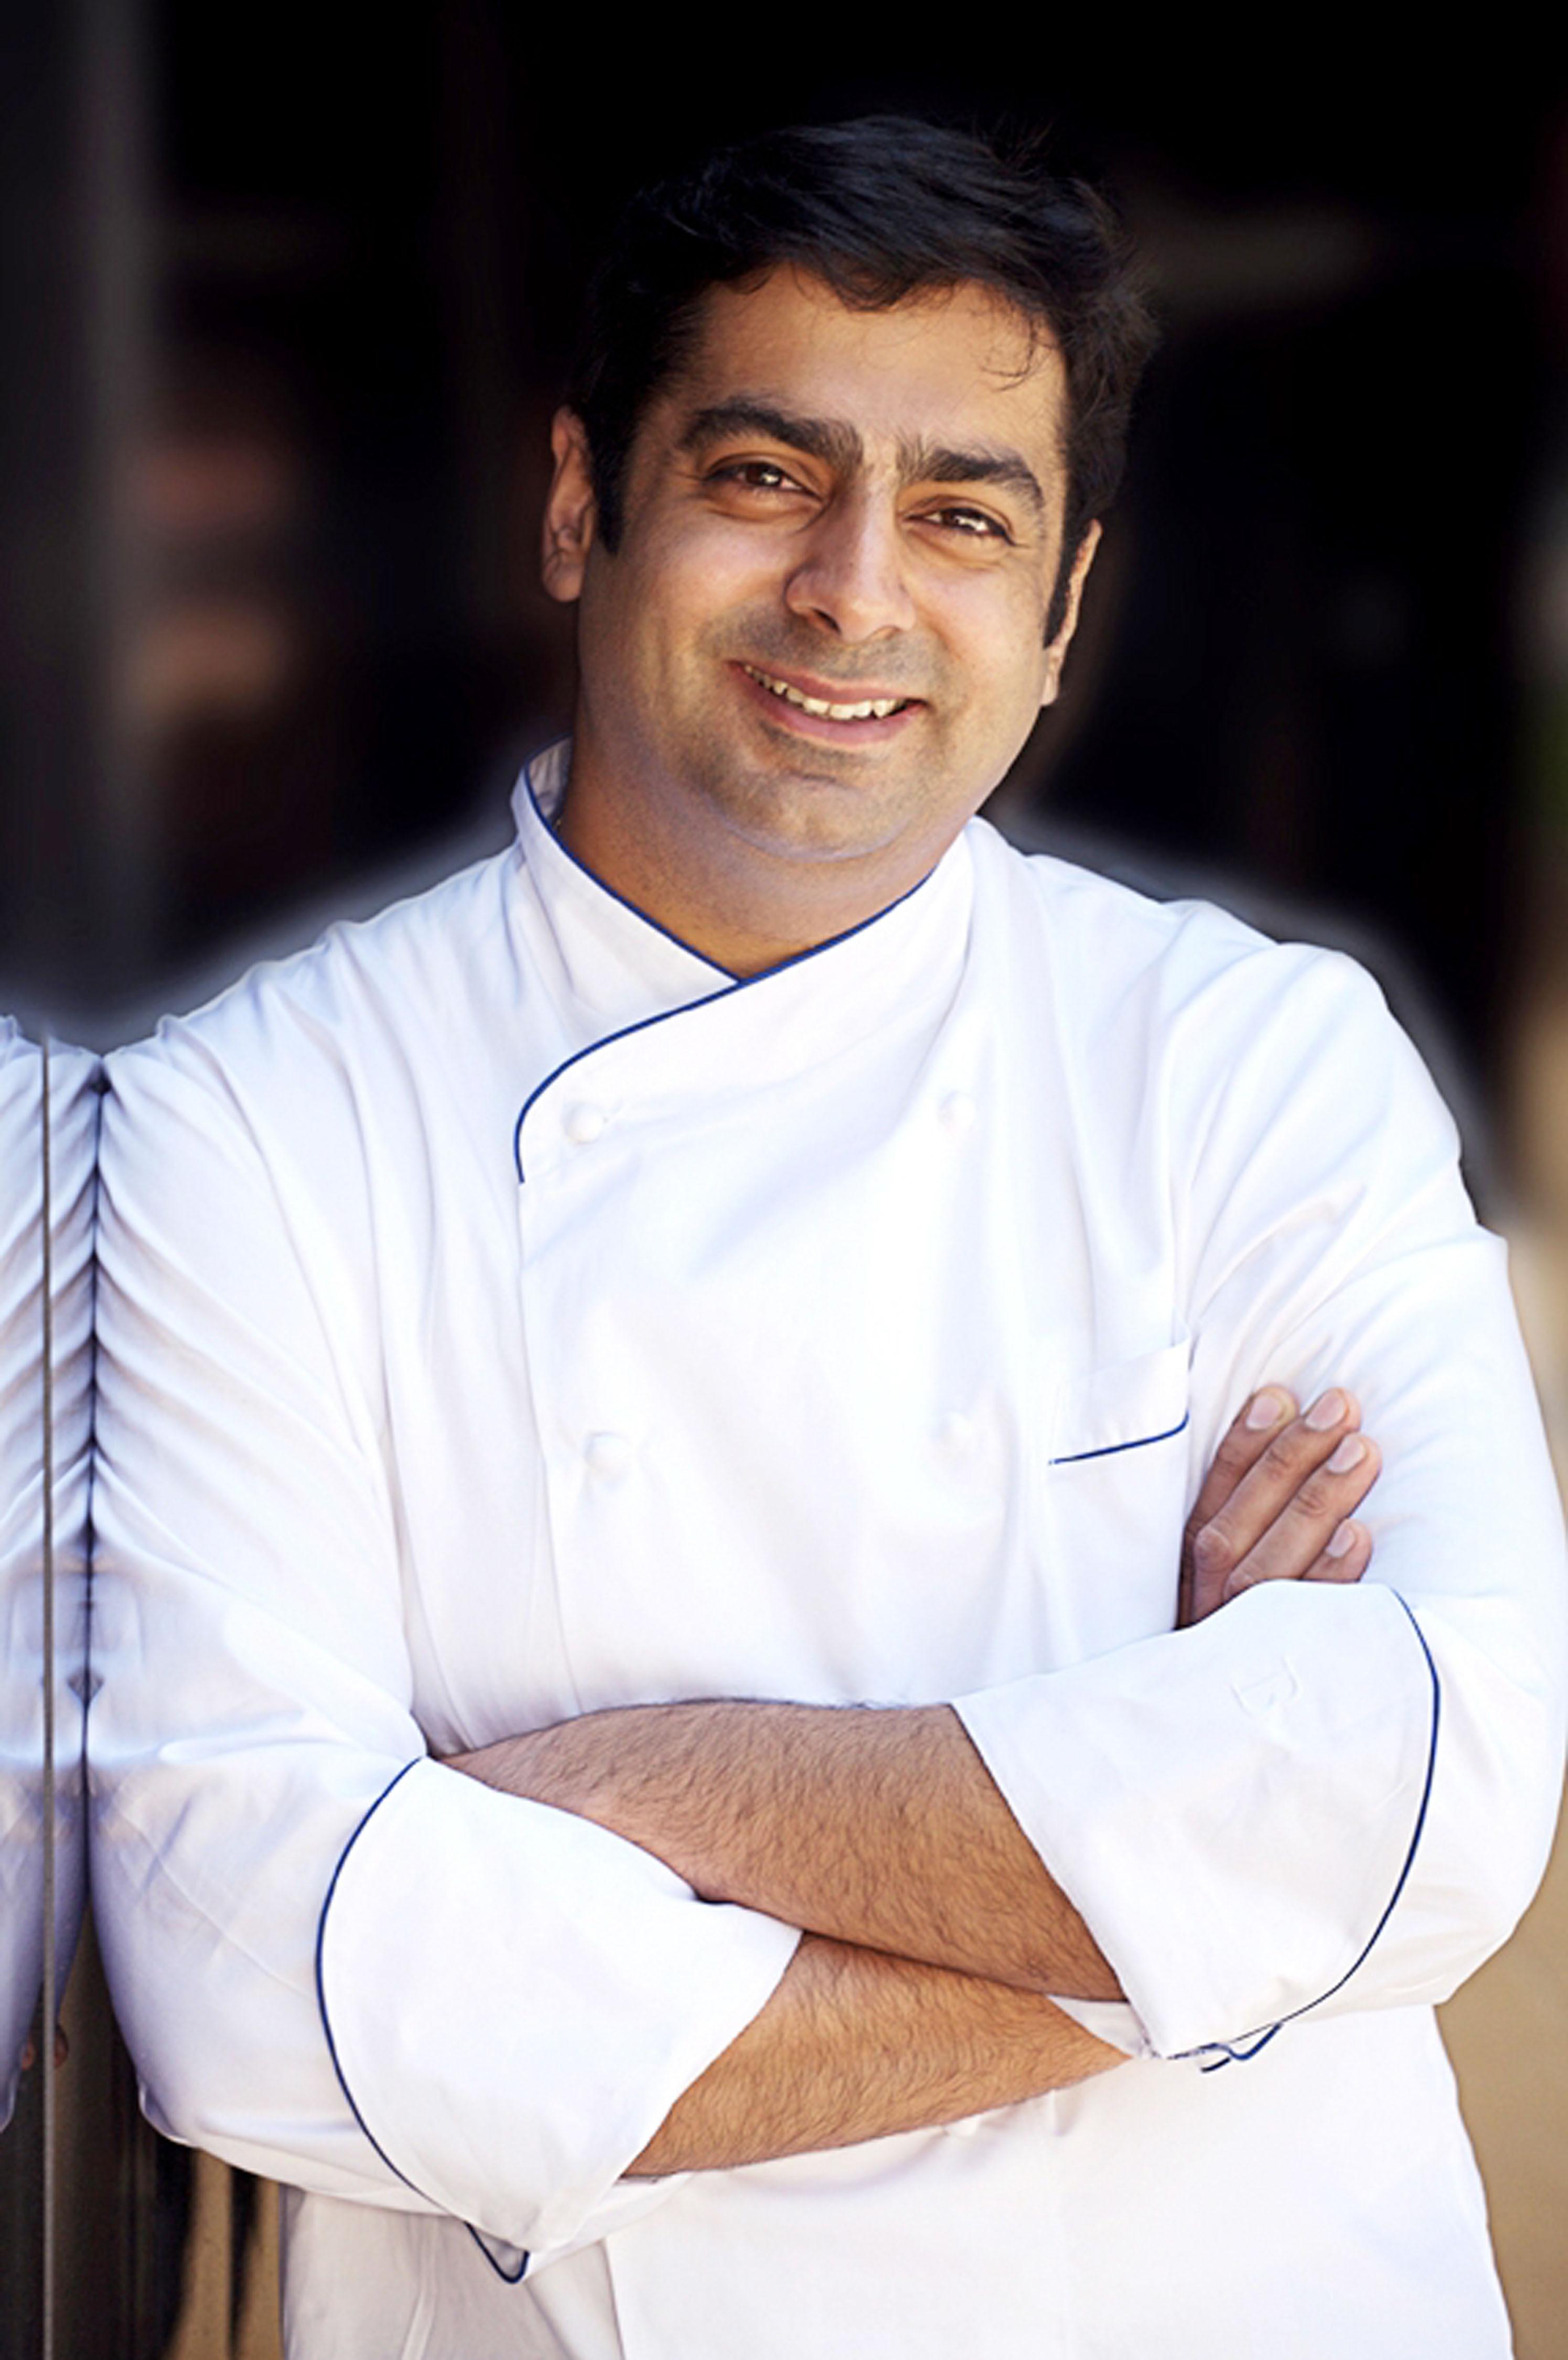 chef gautam-travel with chef